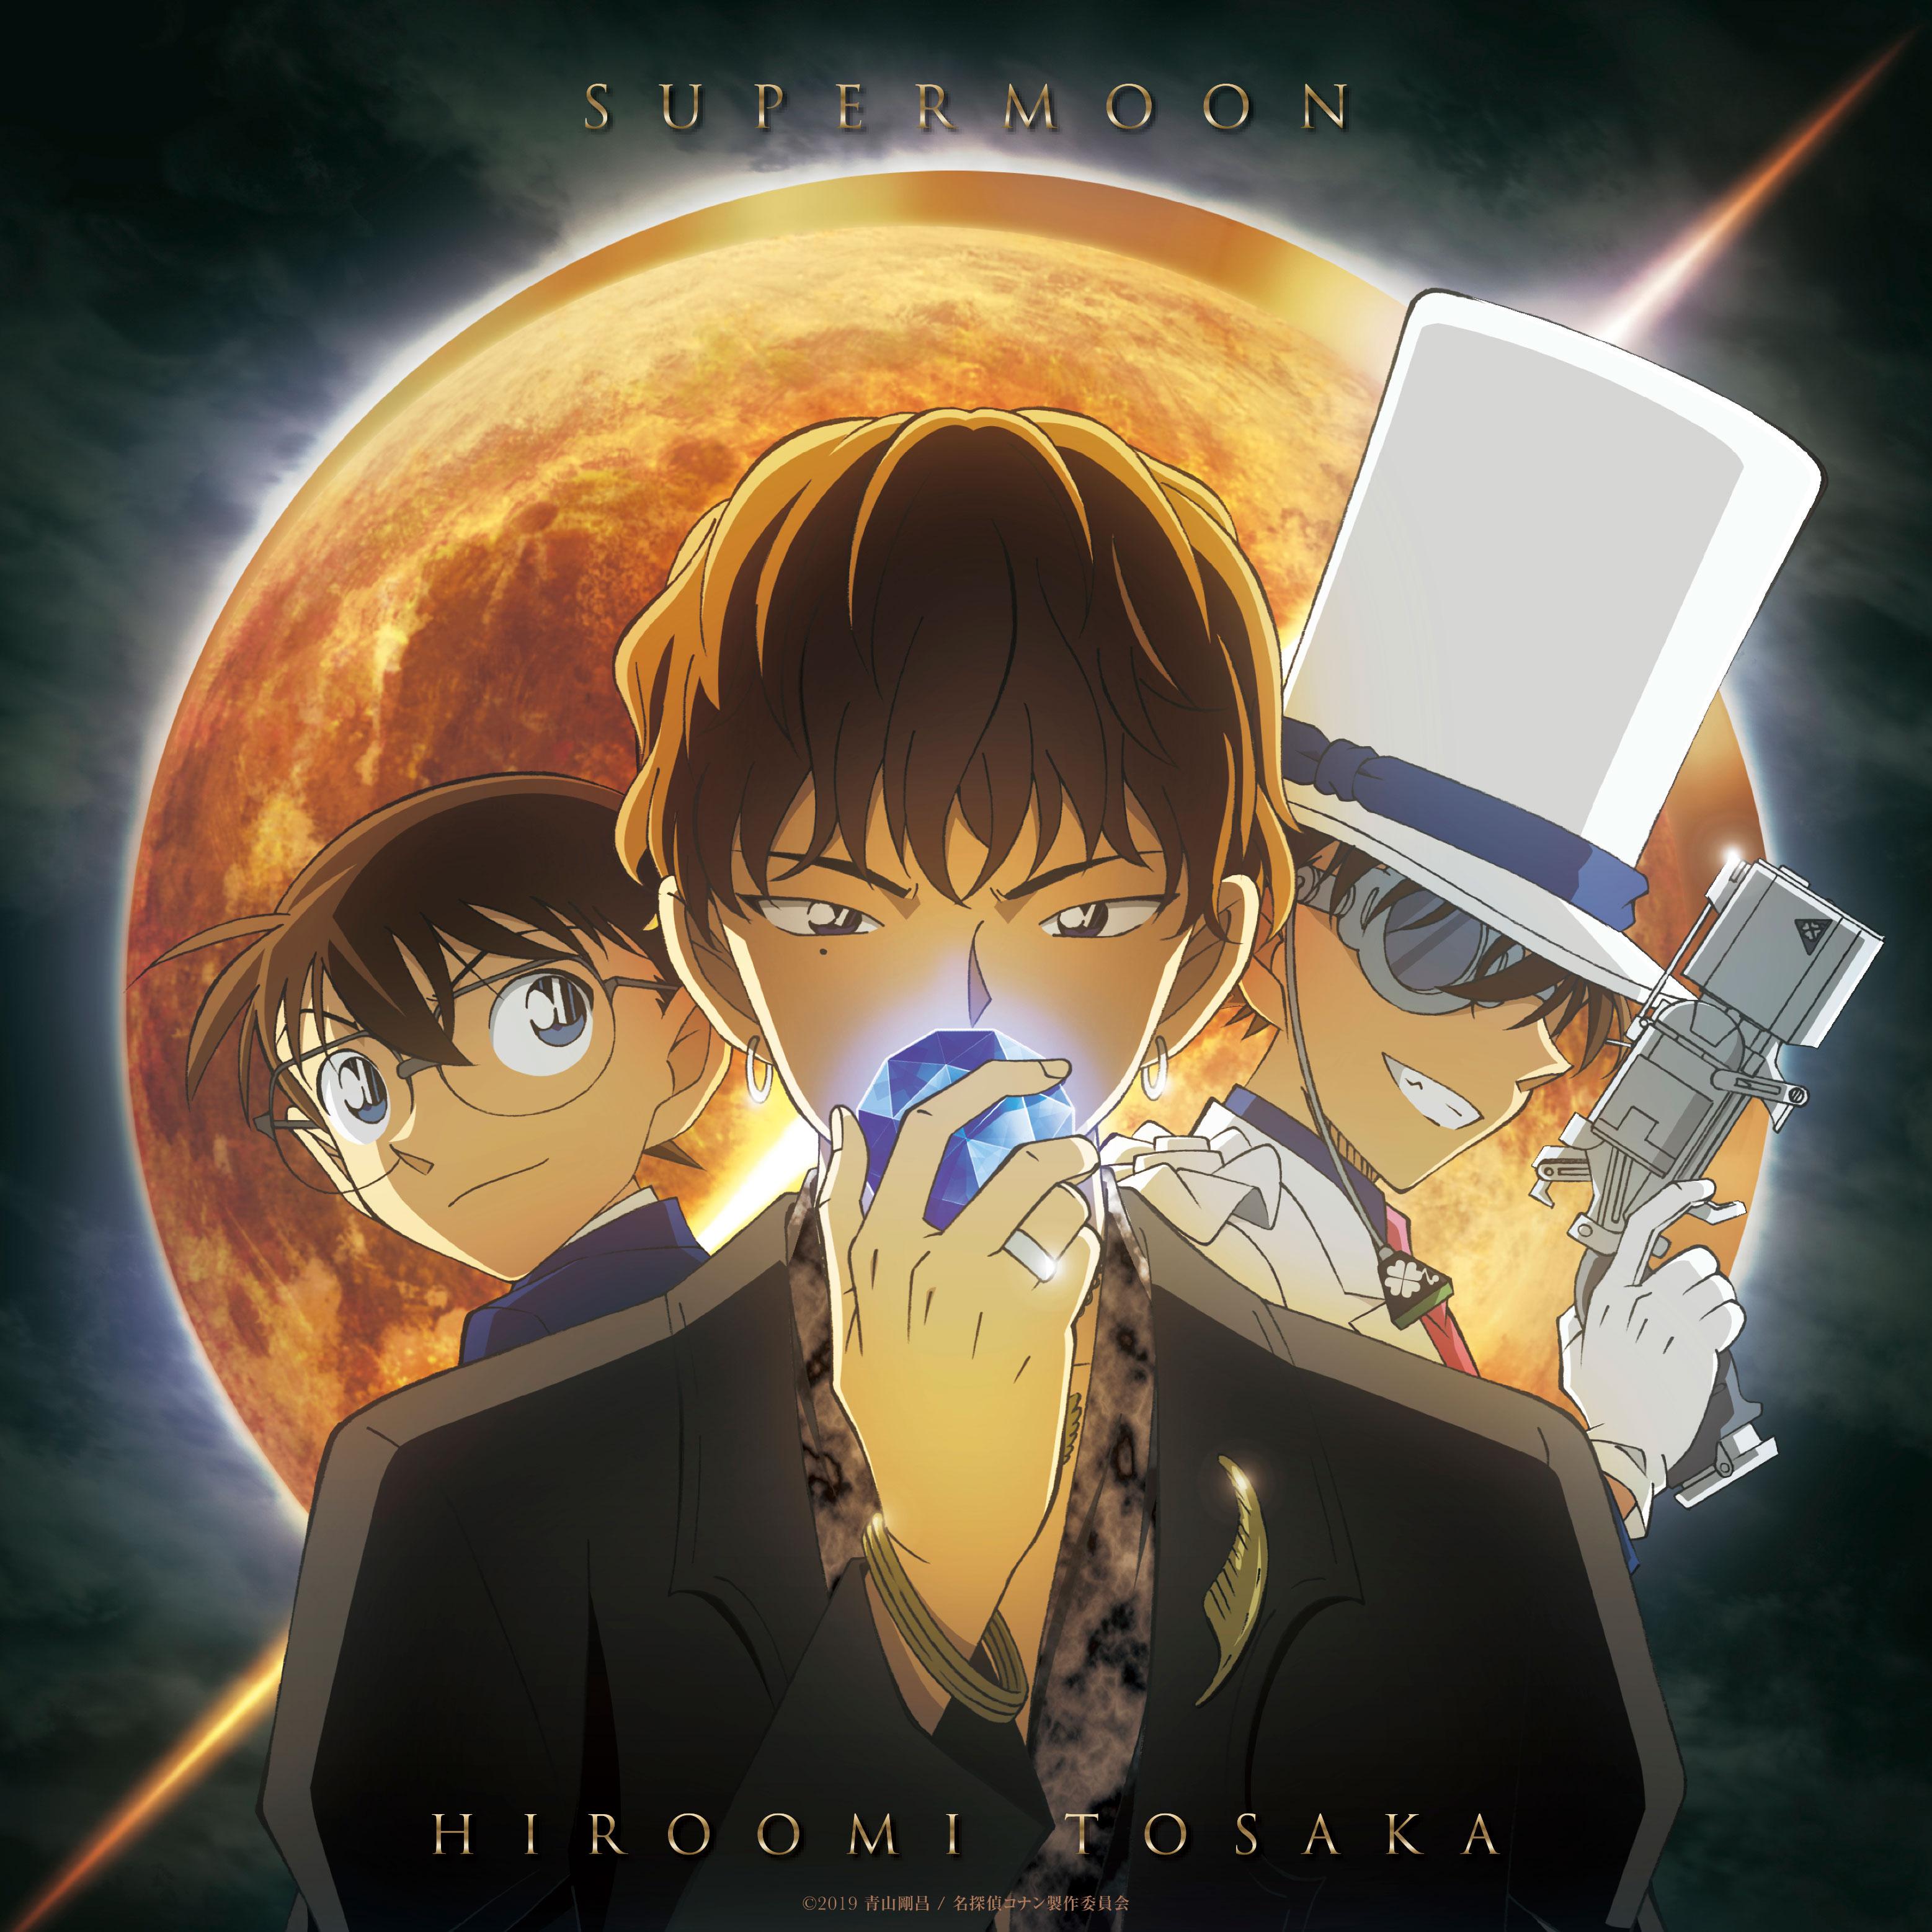 HIROOMI TOSAKAが名探偵コナンの劇場版主題歌を含む『SUPERMOON』をリリース!